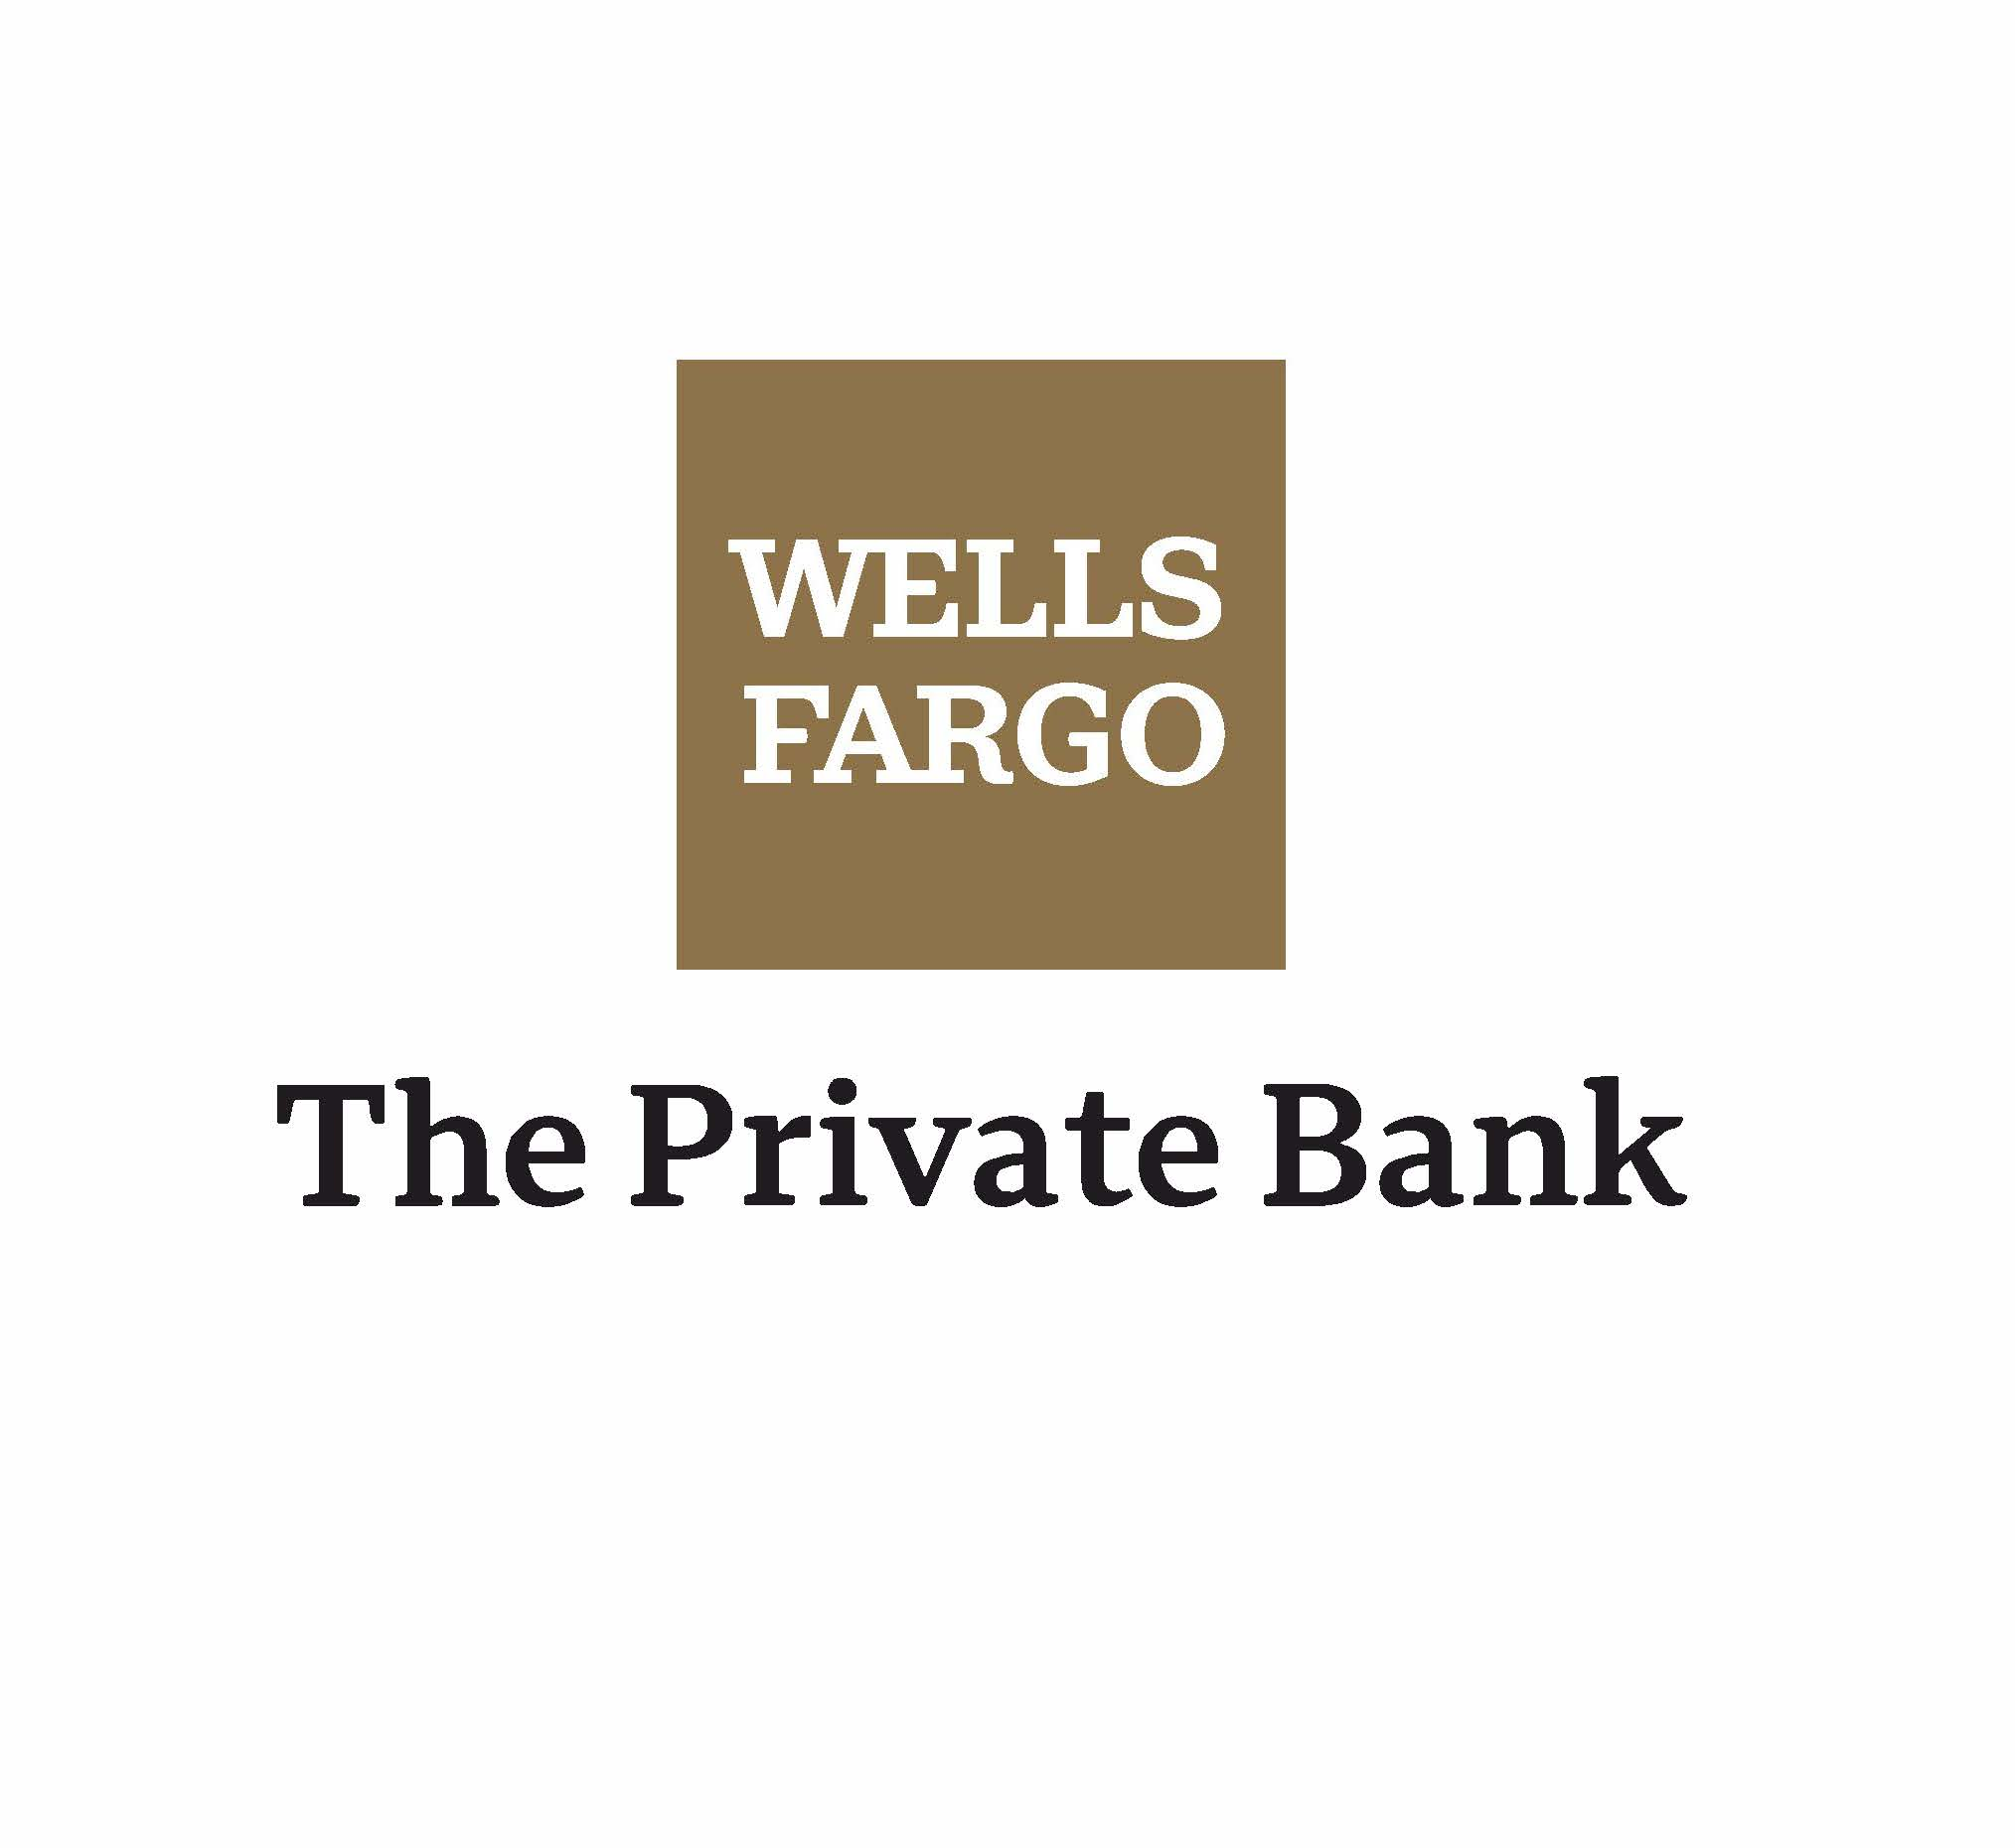 Wells Fargo Private Bank